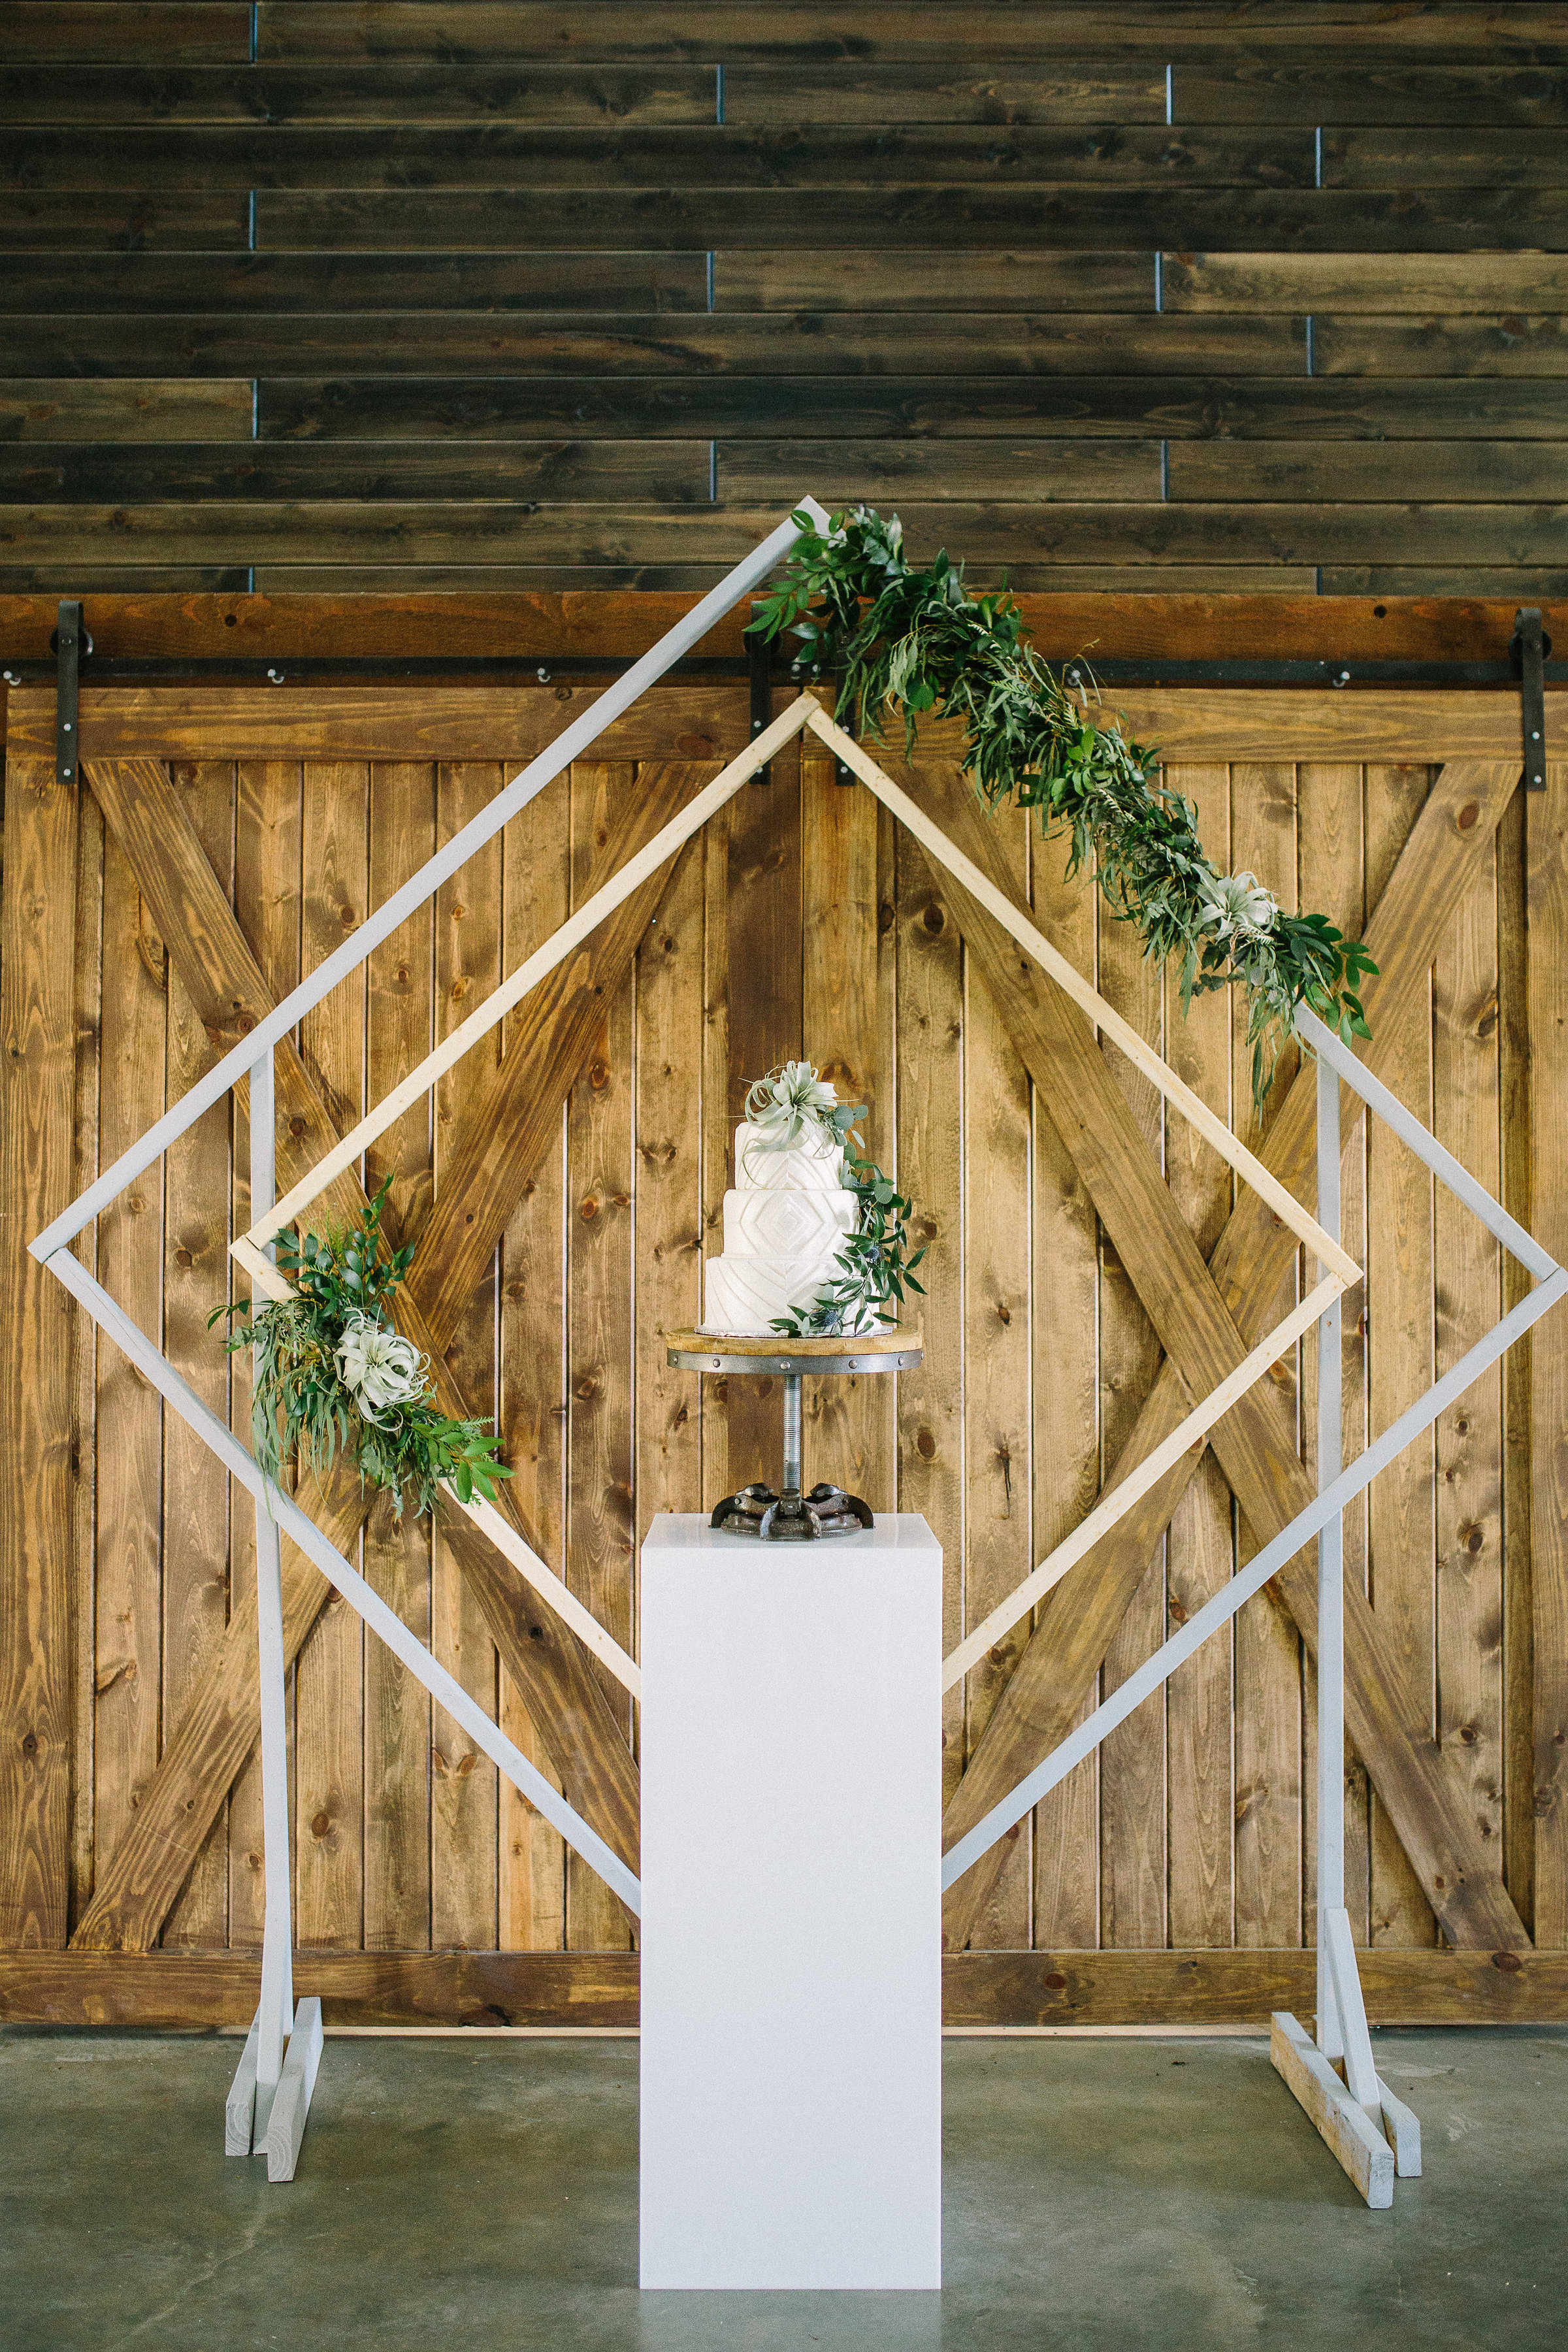 Ellen-Ashton-Photography-Peach-Creek-Ranch-Weddings-Wed-and-Prosper127